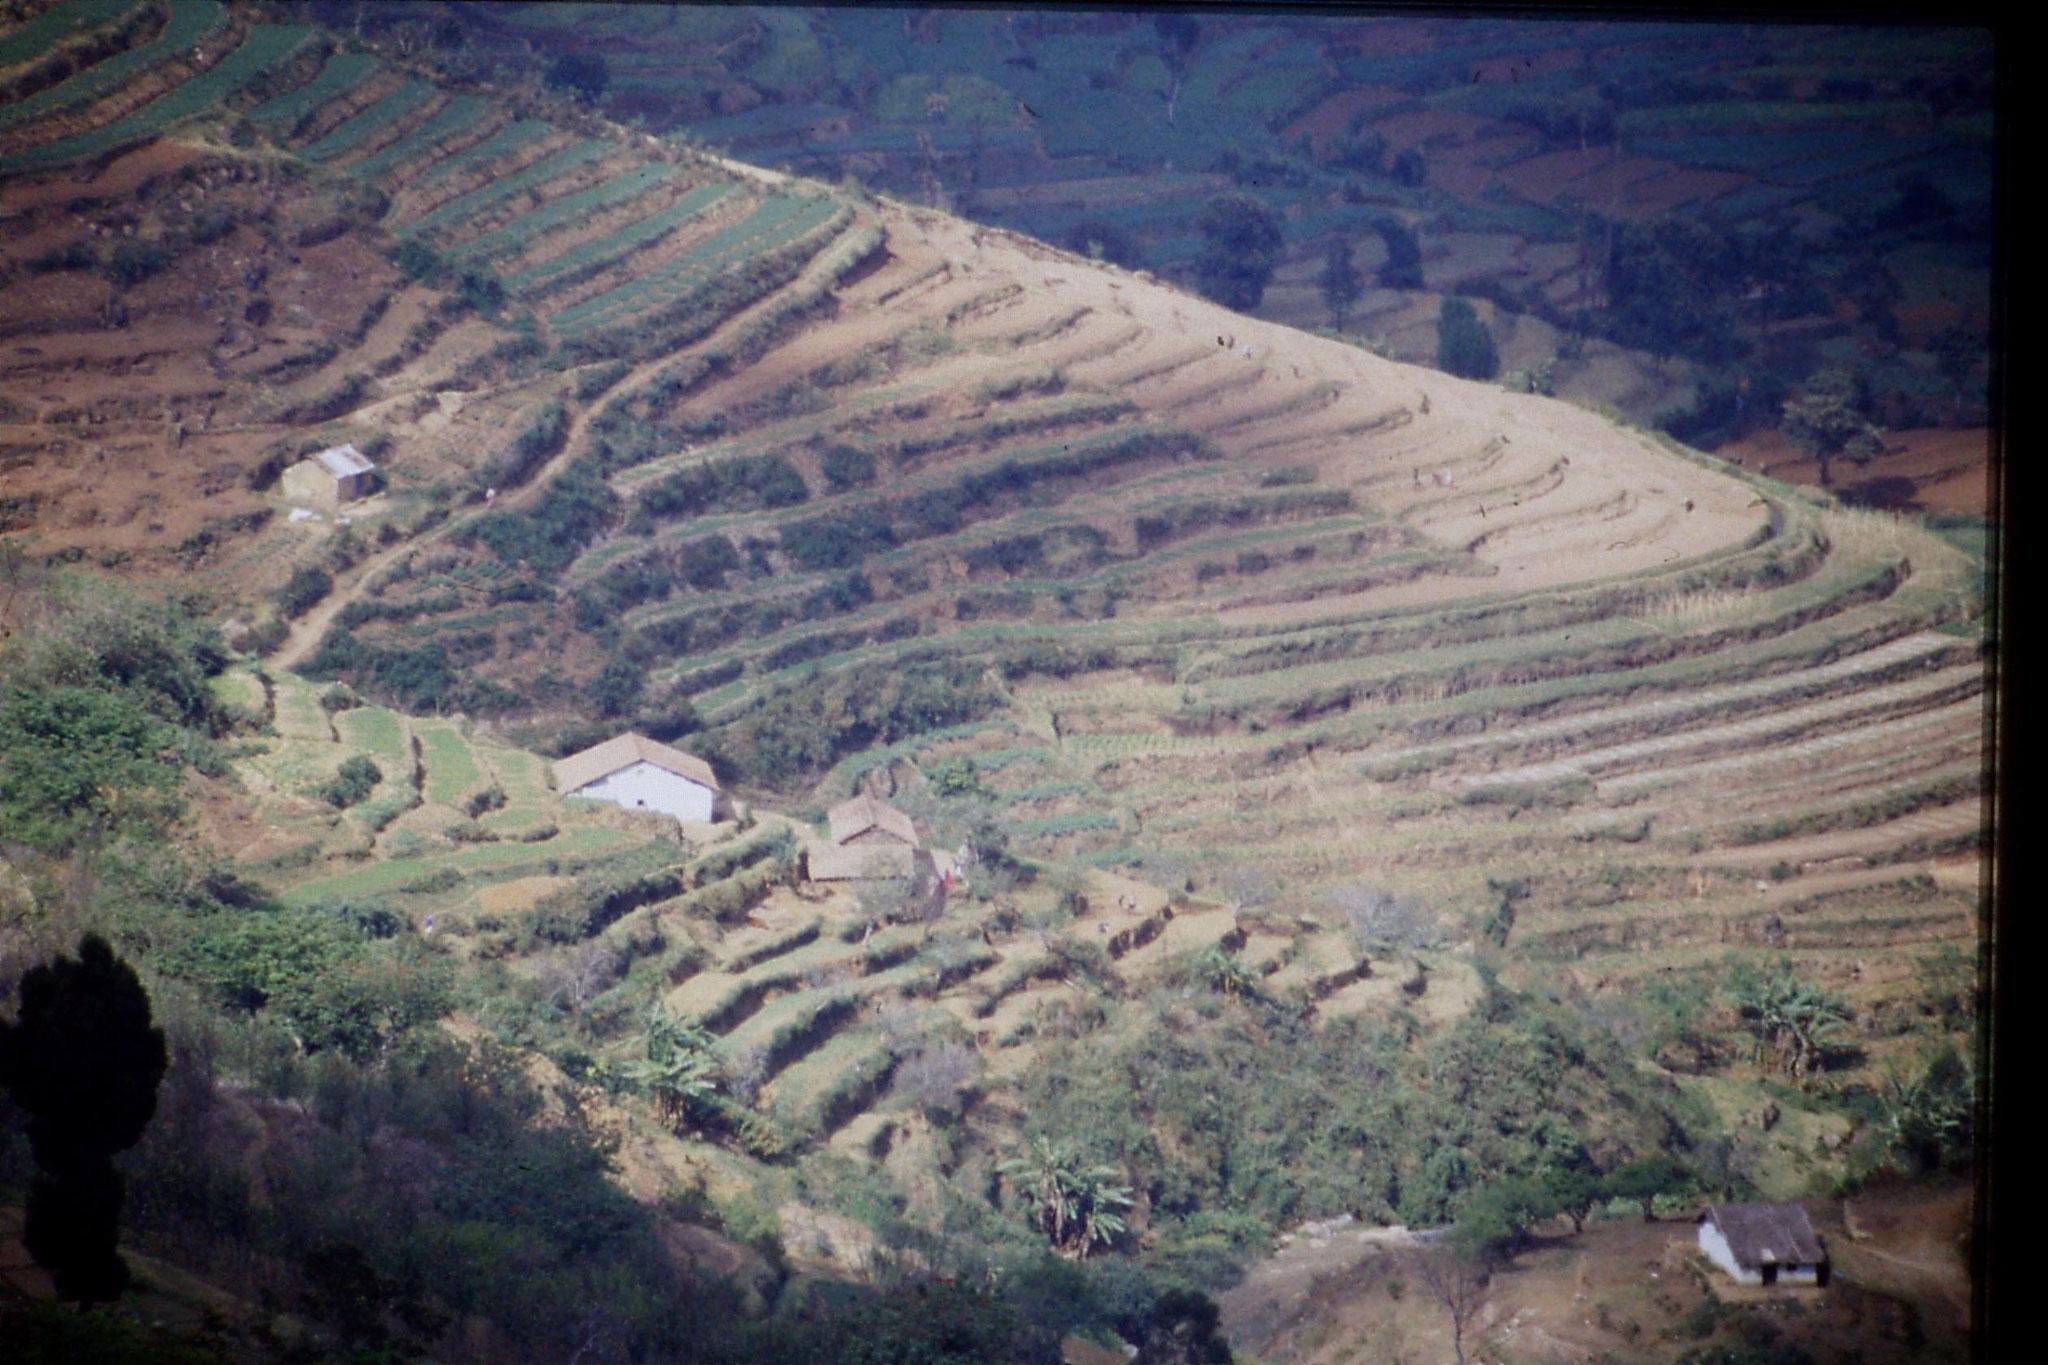 104/25: 20/2/1990 Vilpatti village and surroundings from Kodai road